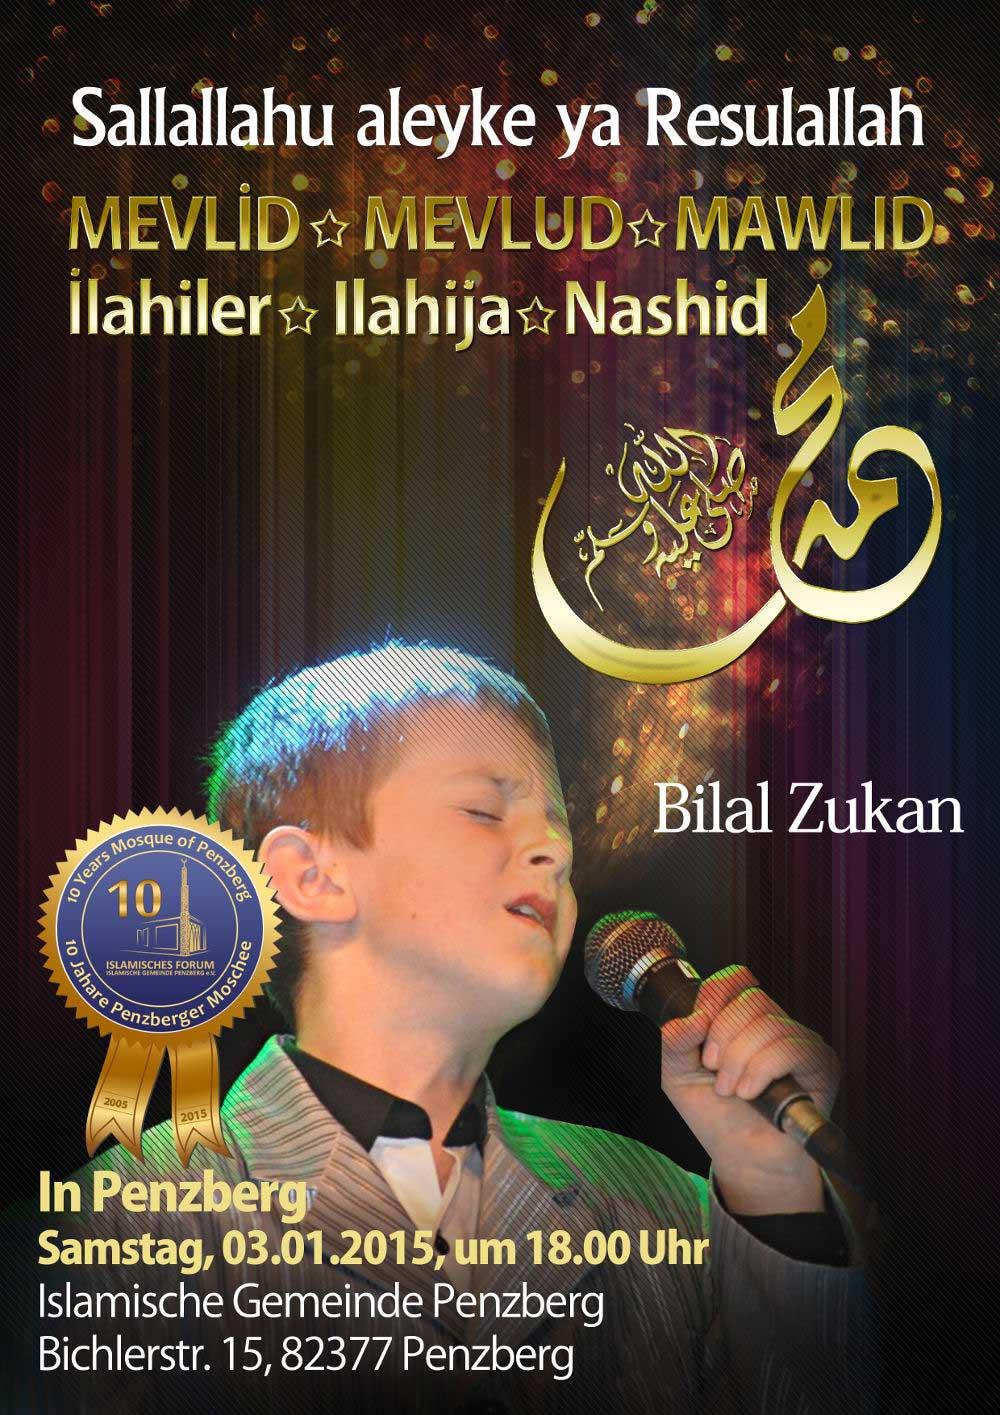 IGP Veranstaltung: Bilal Zukan